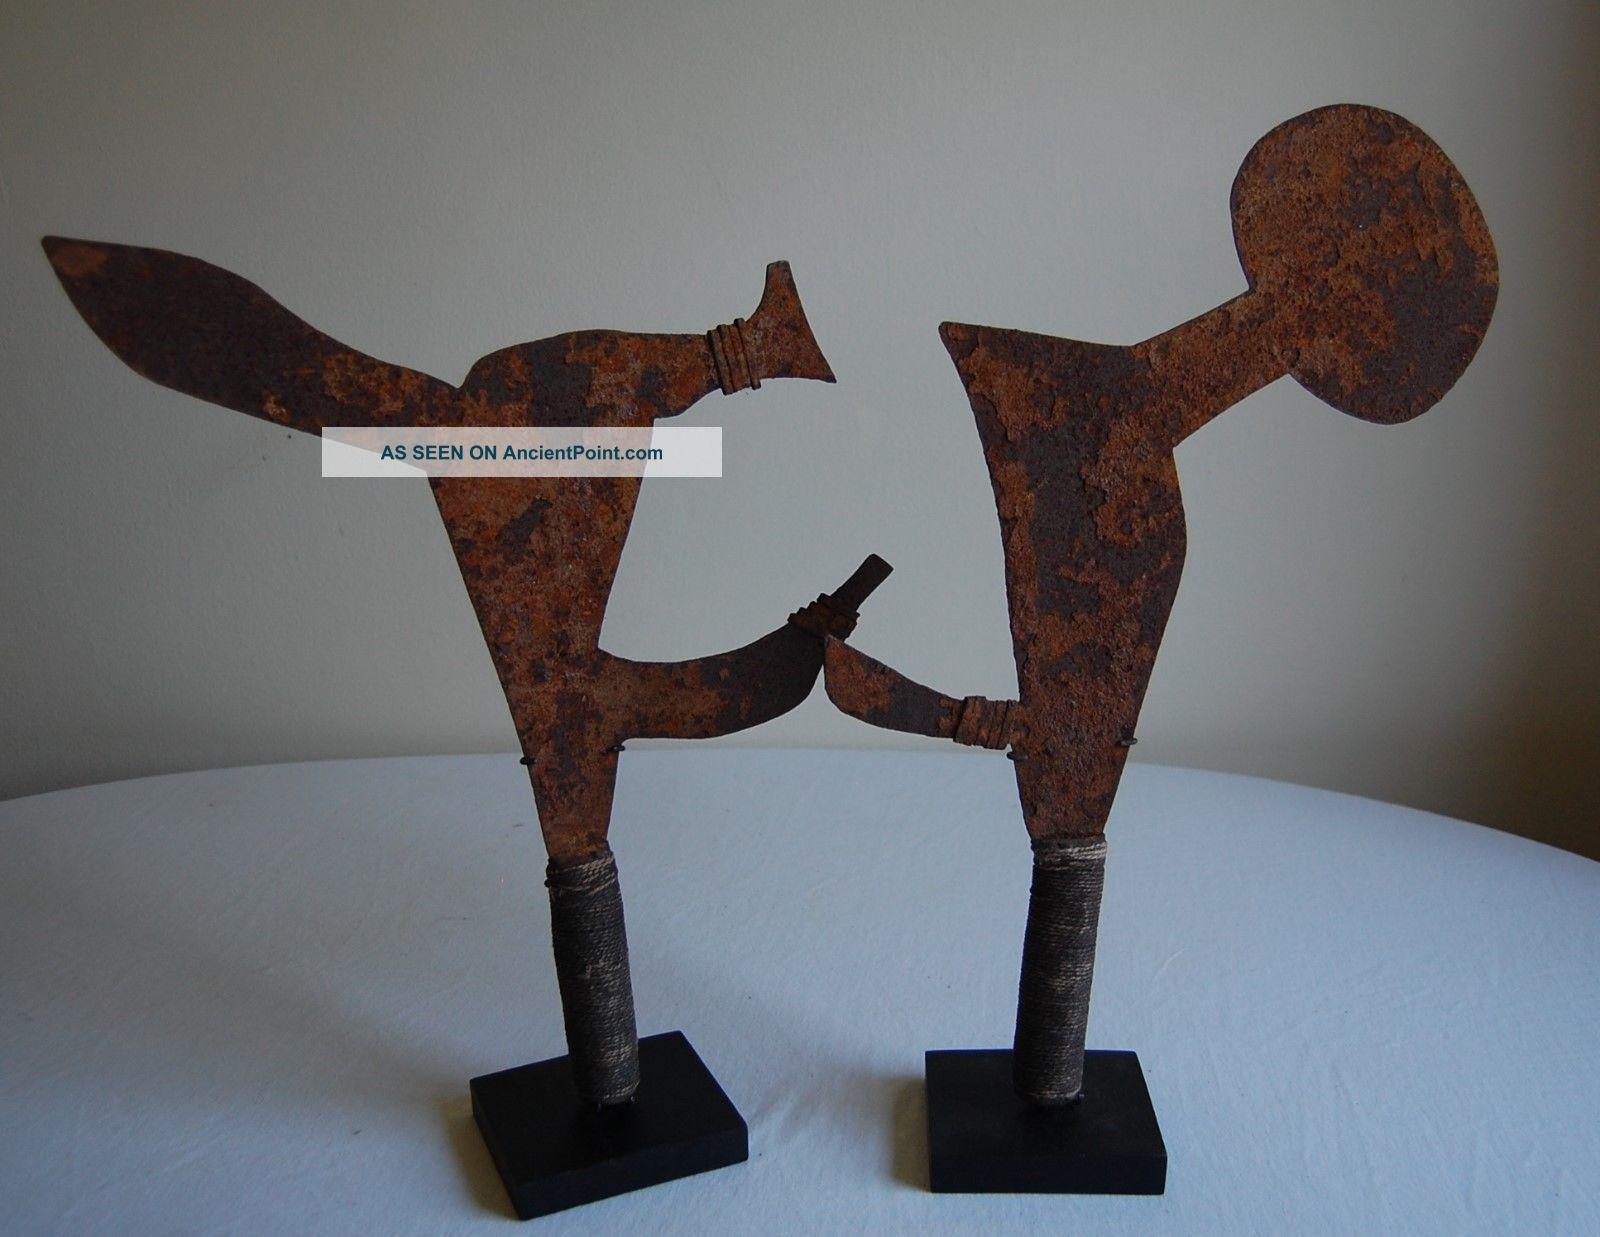 Abstract Ceremonial Blades - Konkomba Sculptures & Statues photo